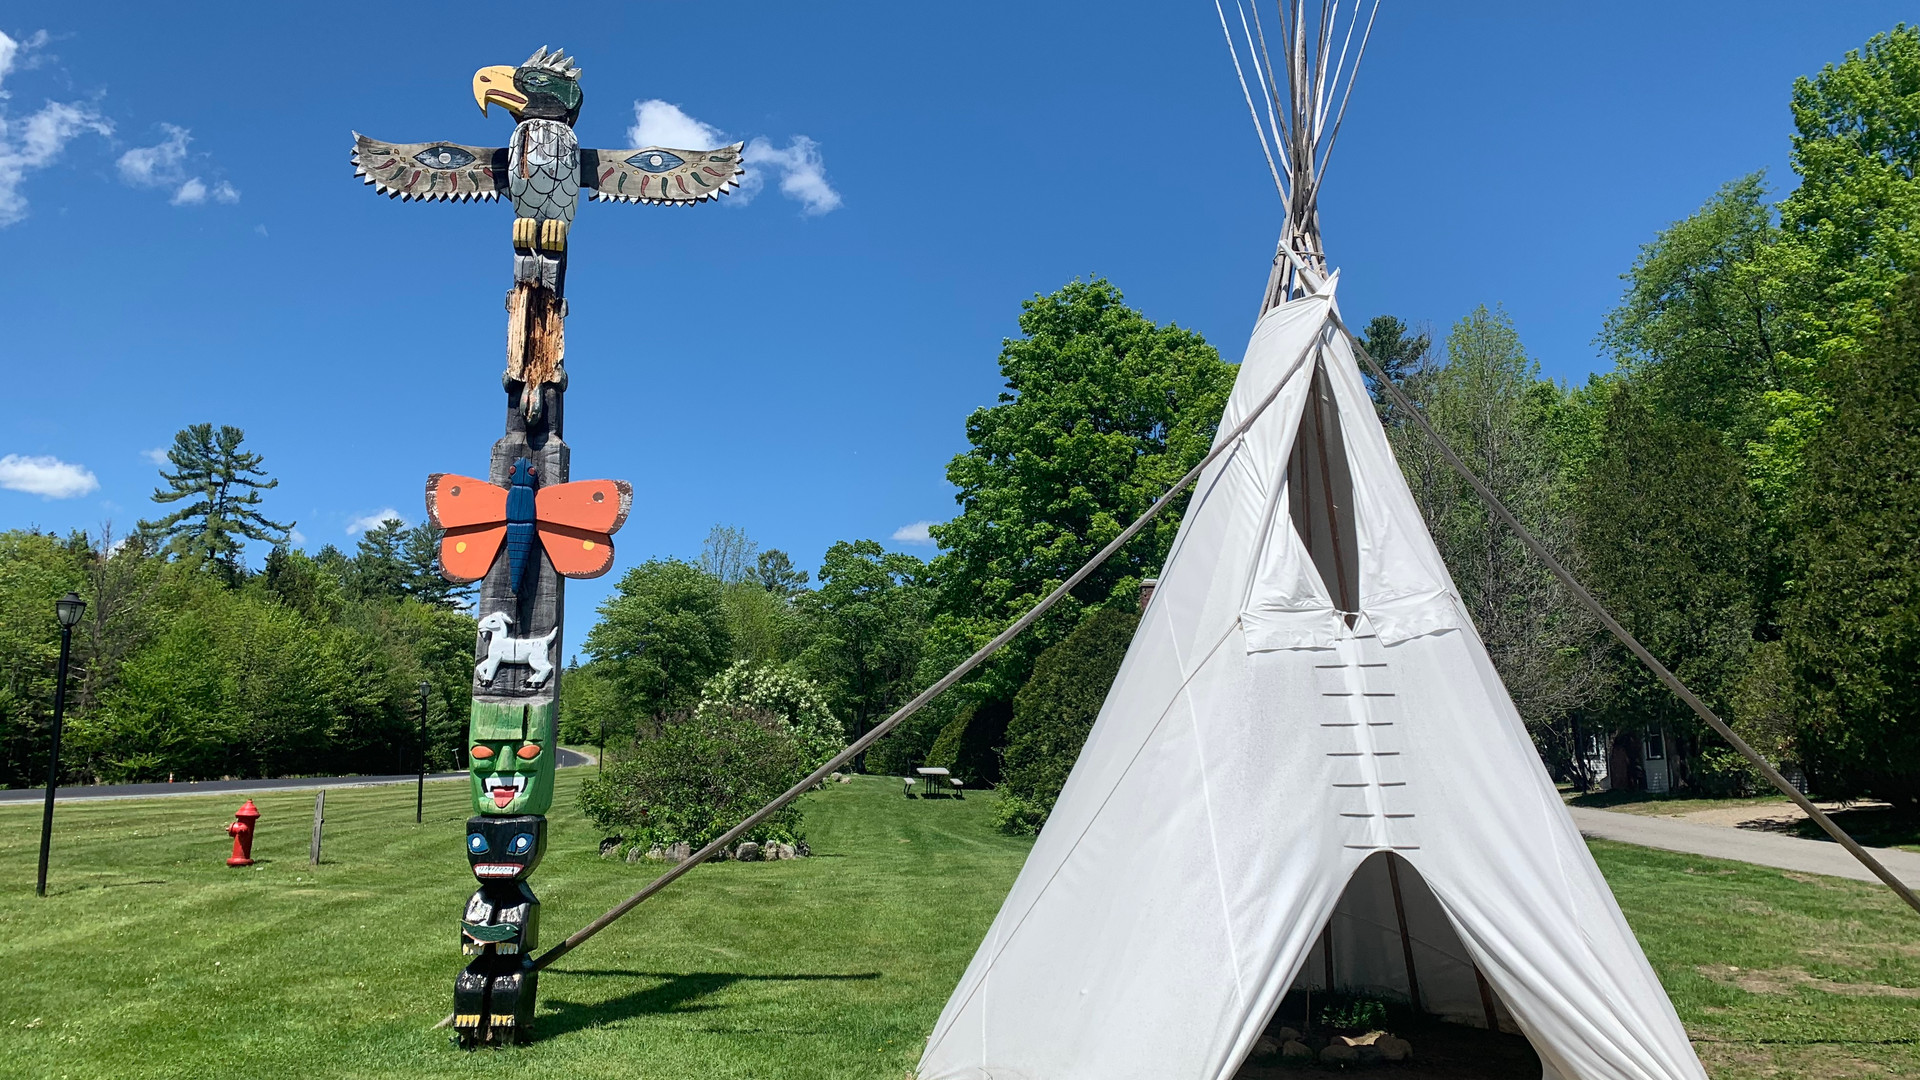 Teepee and Totem Pole